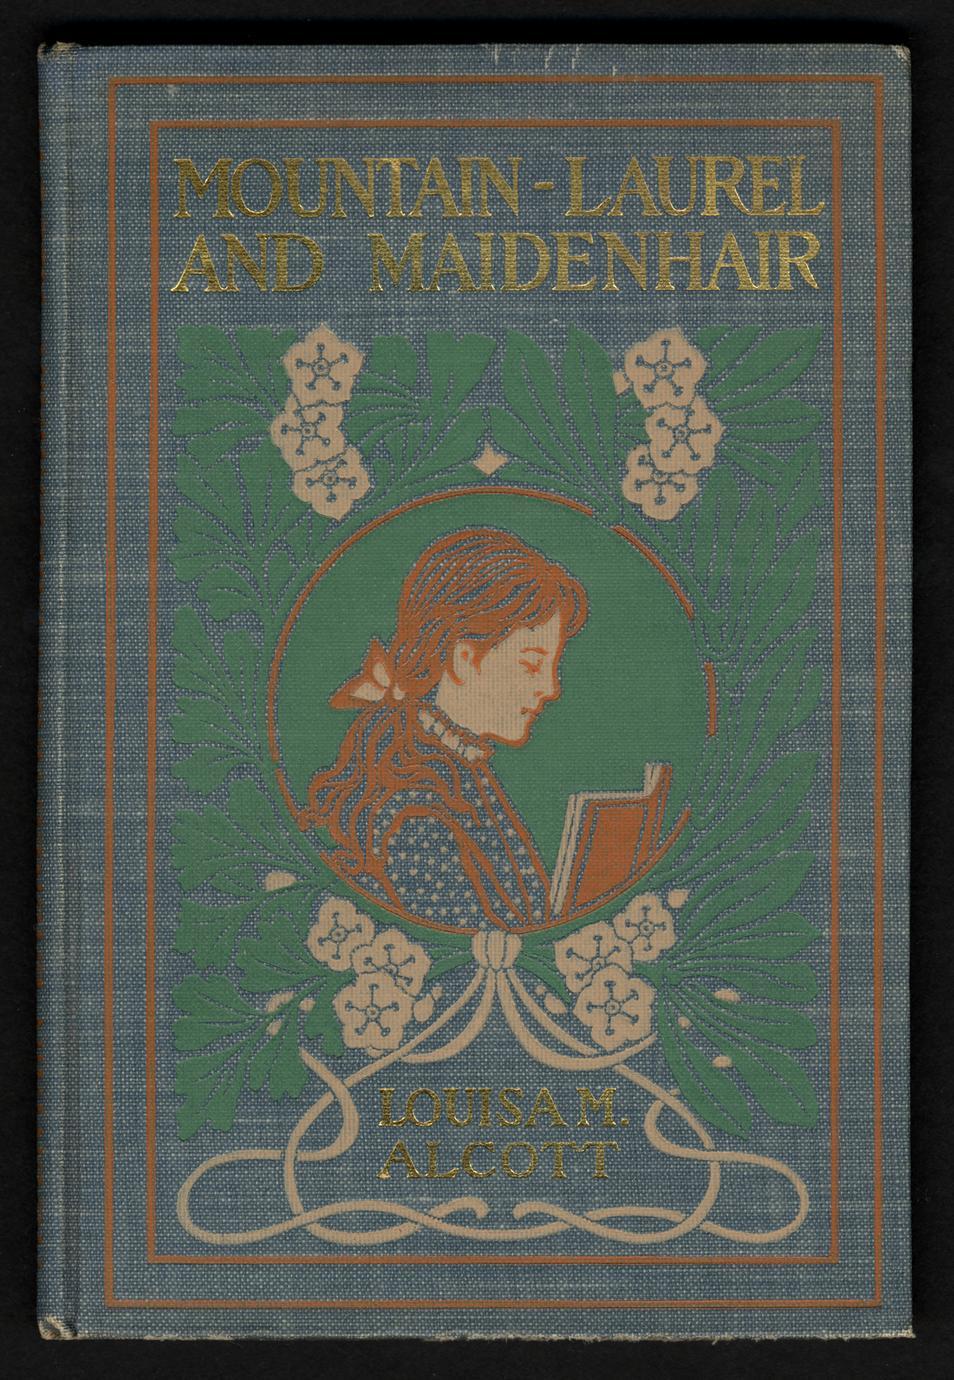 Mountain-laurel and maidenhair (1 of 2)